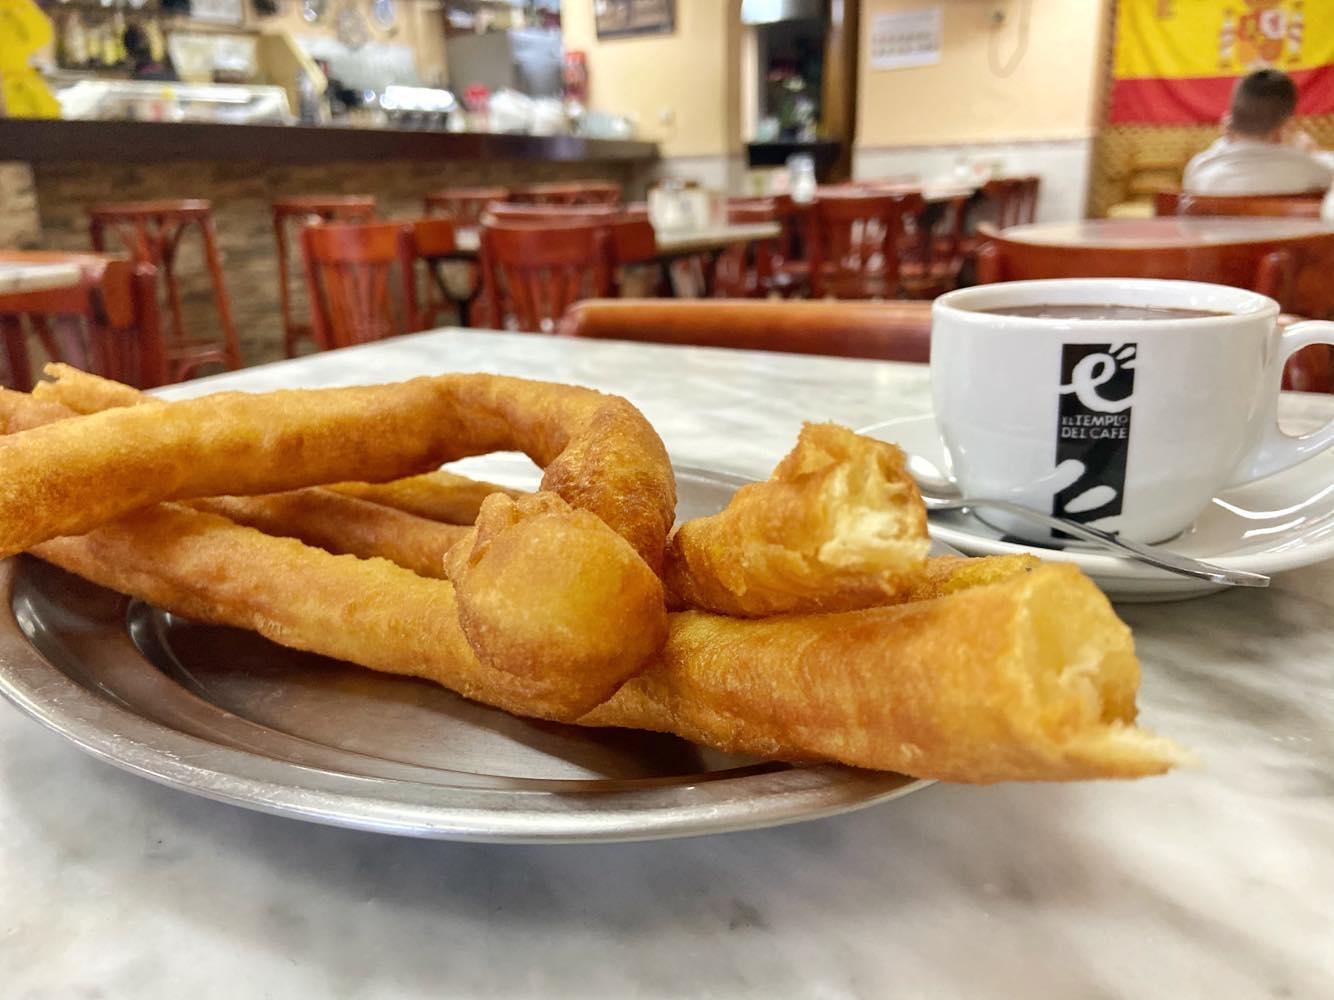 die besten churros in palma mallorca